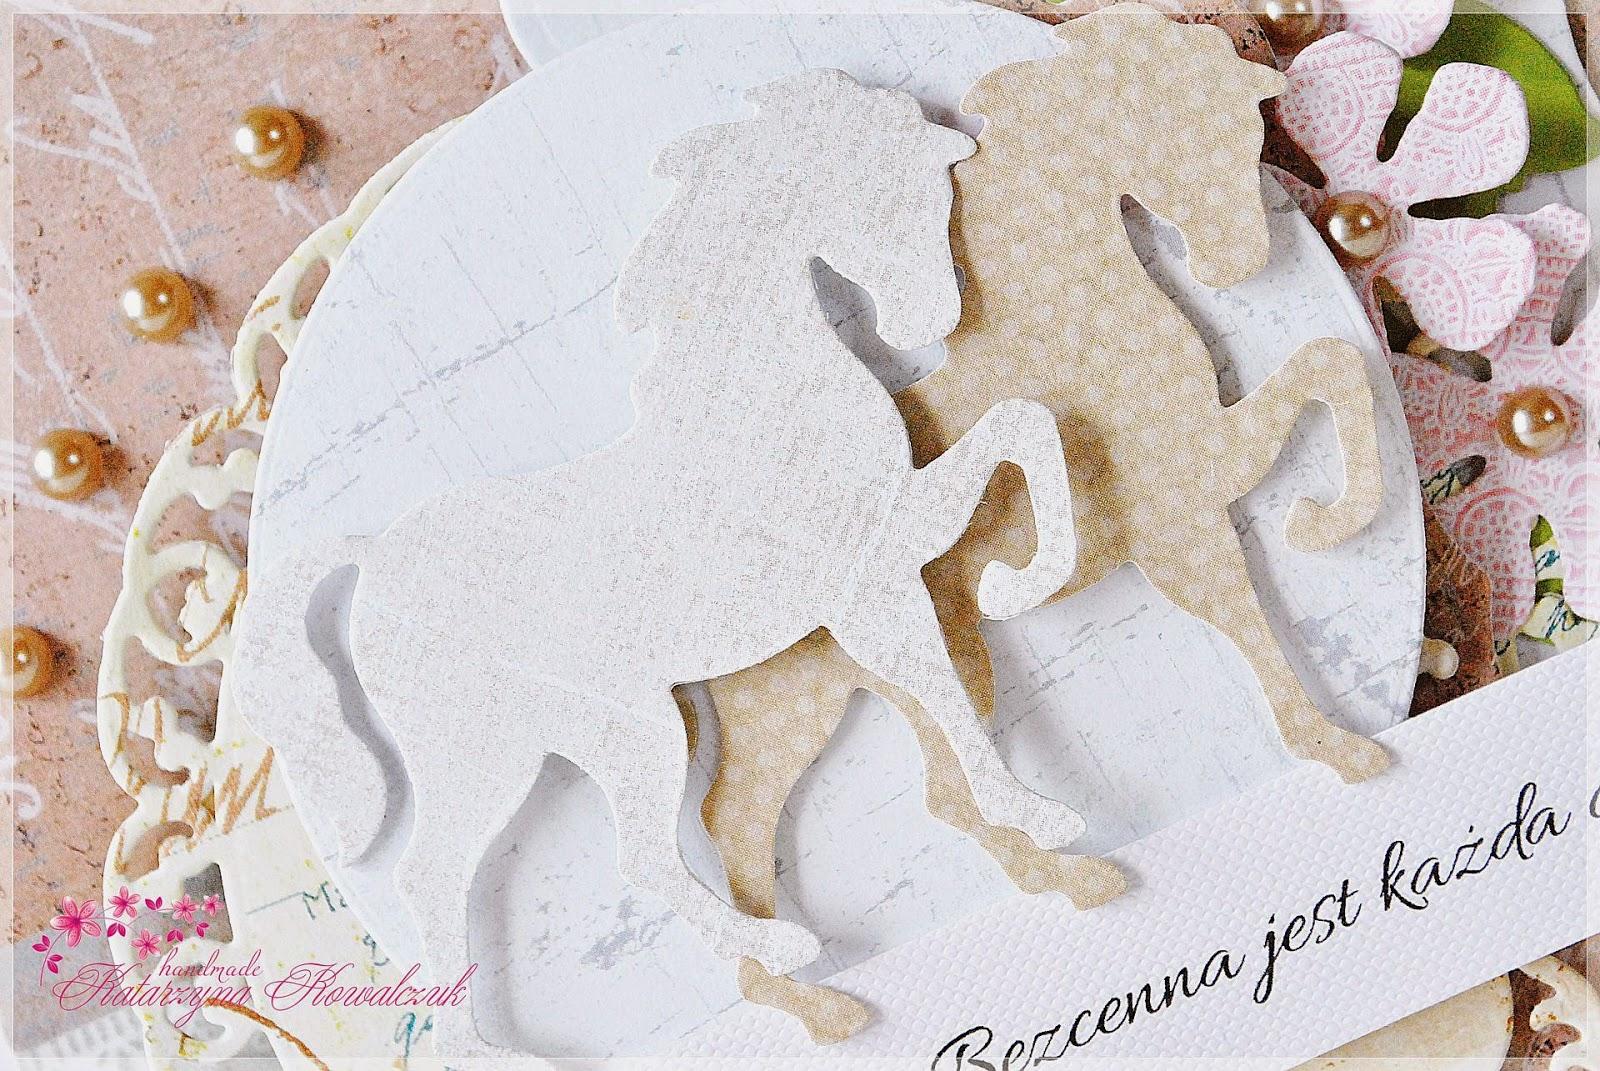 kartka z koniem scrapbooking